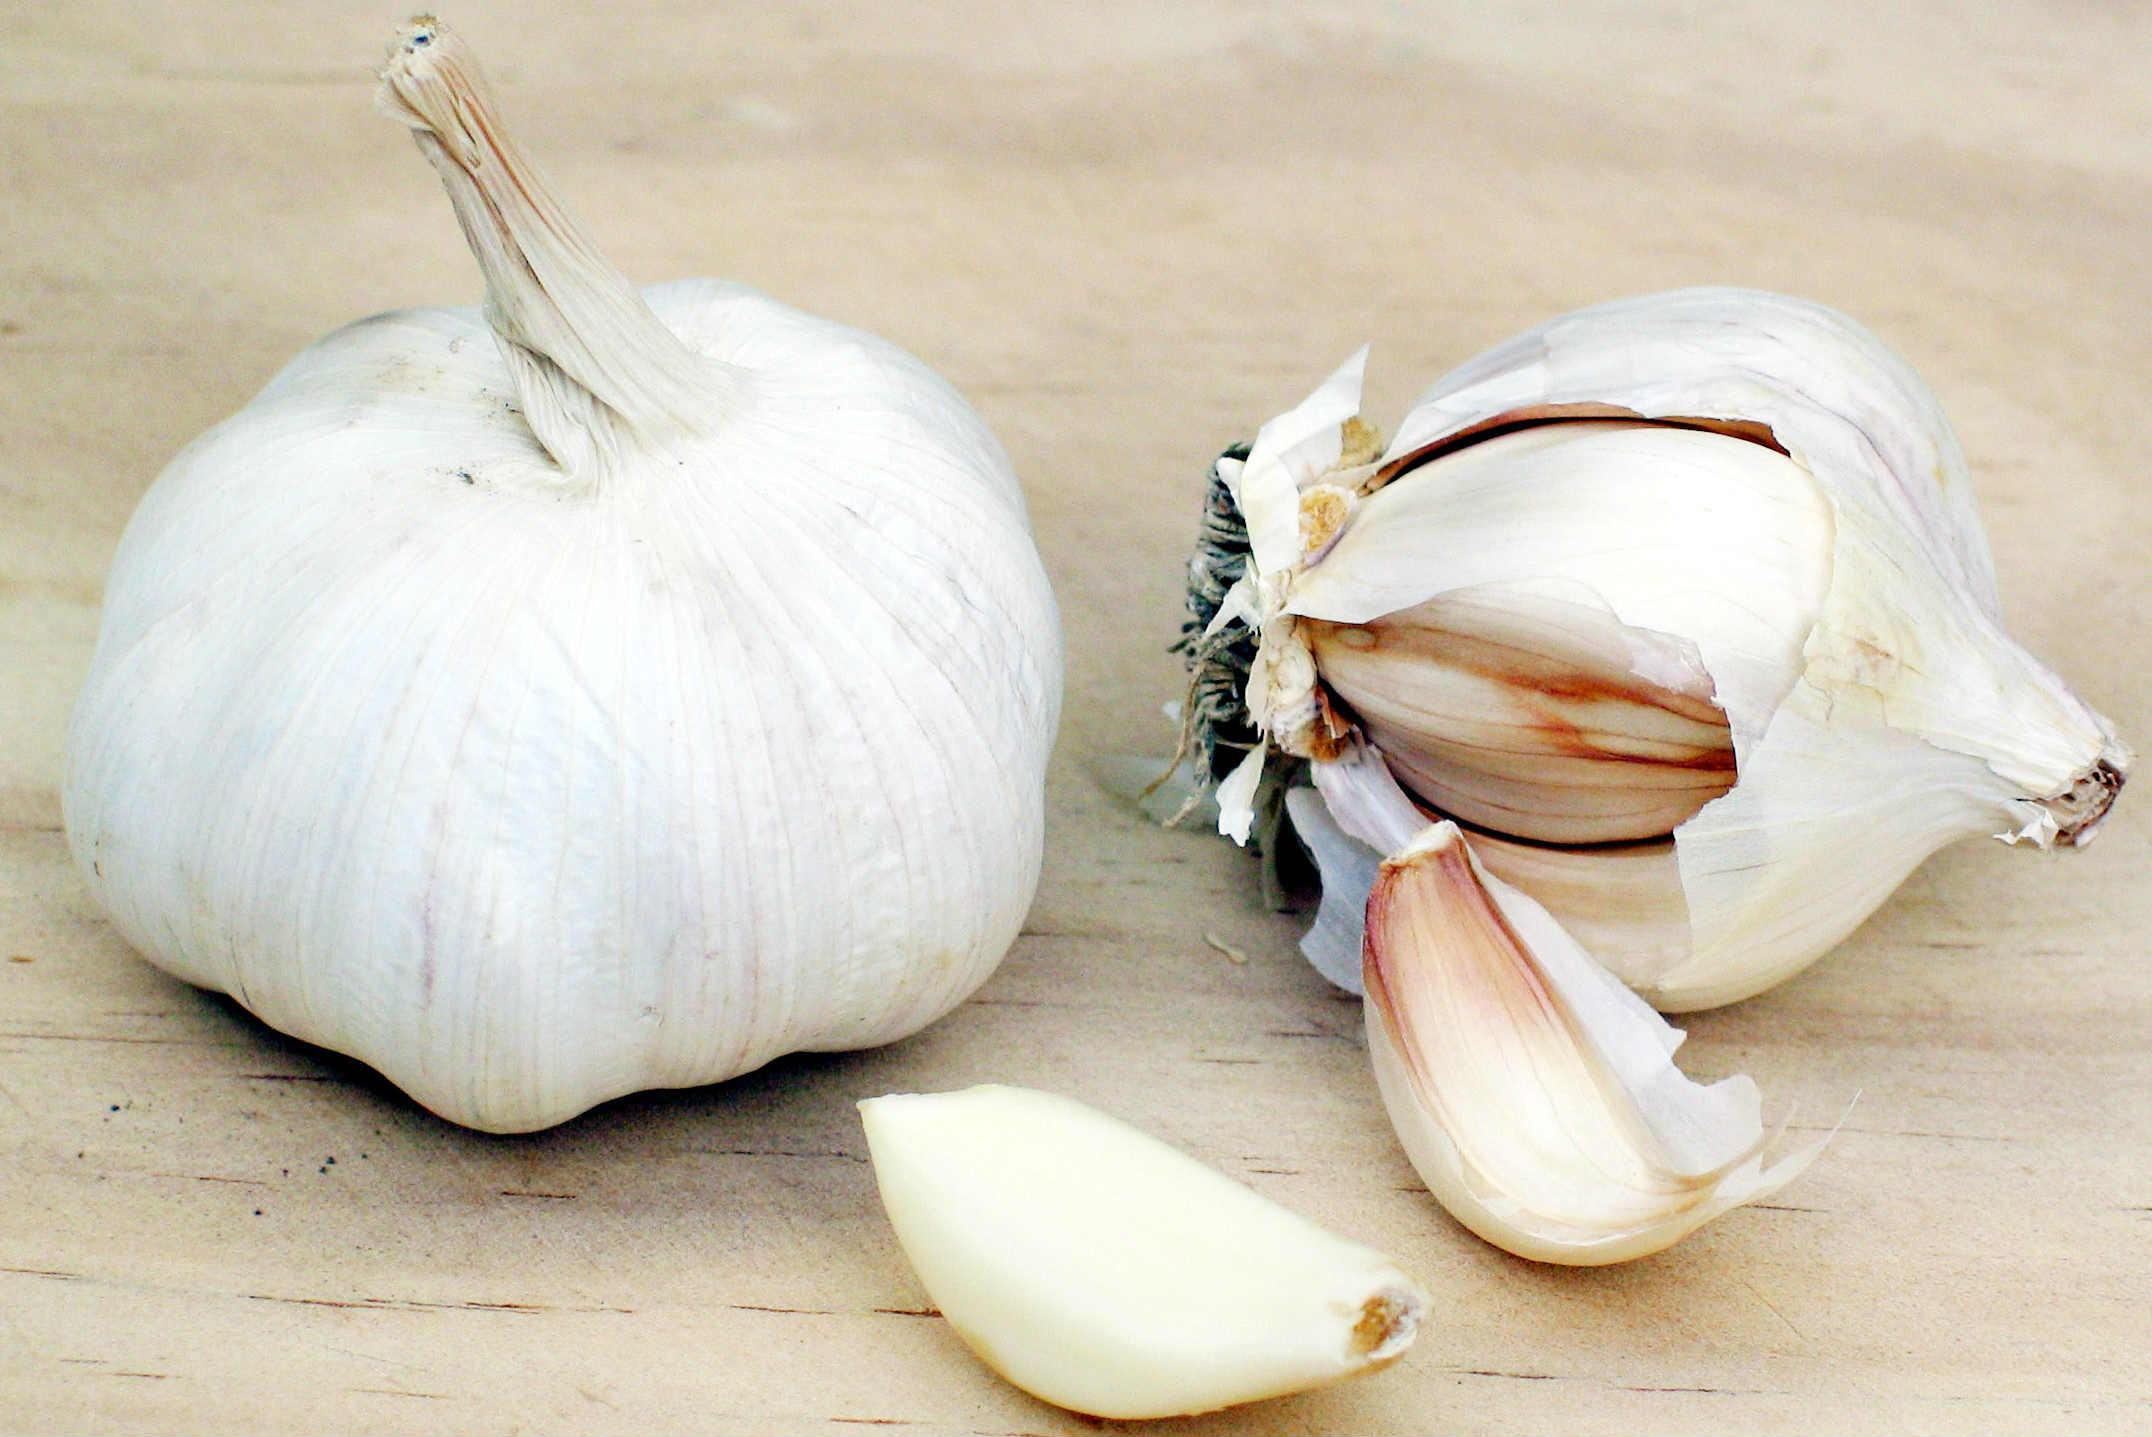 Garlic Extract May Minimize Effects of Gingivitis